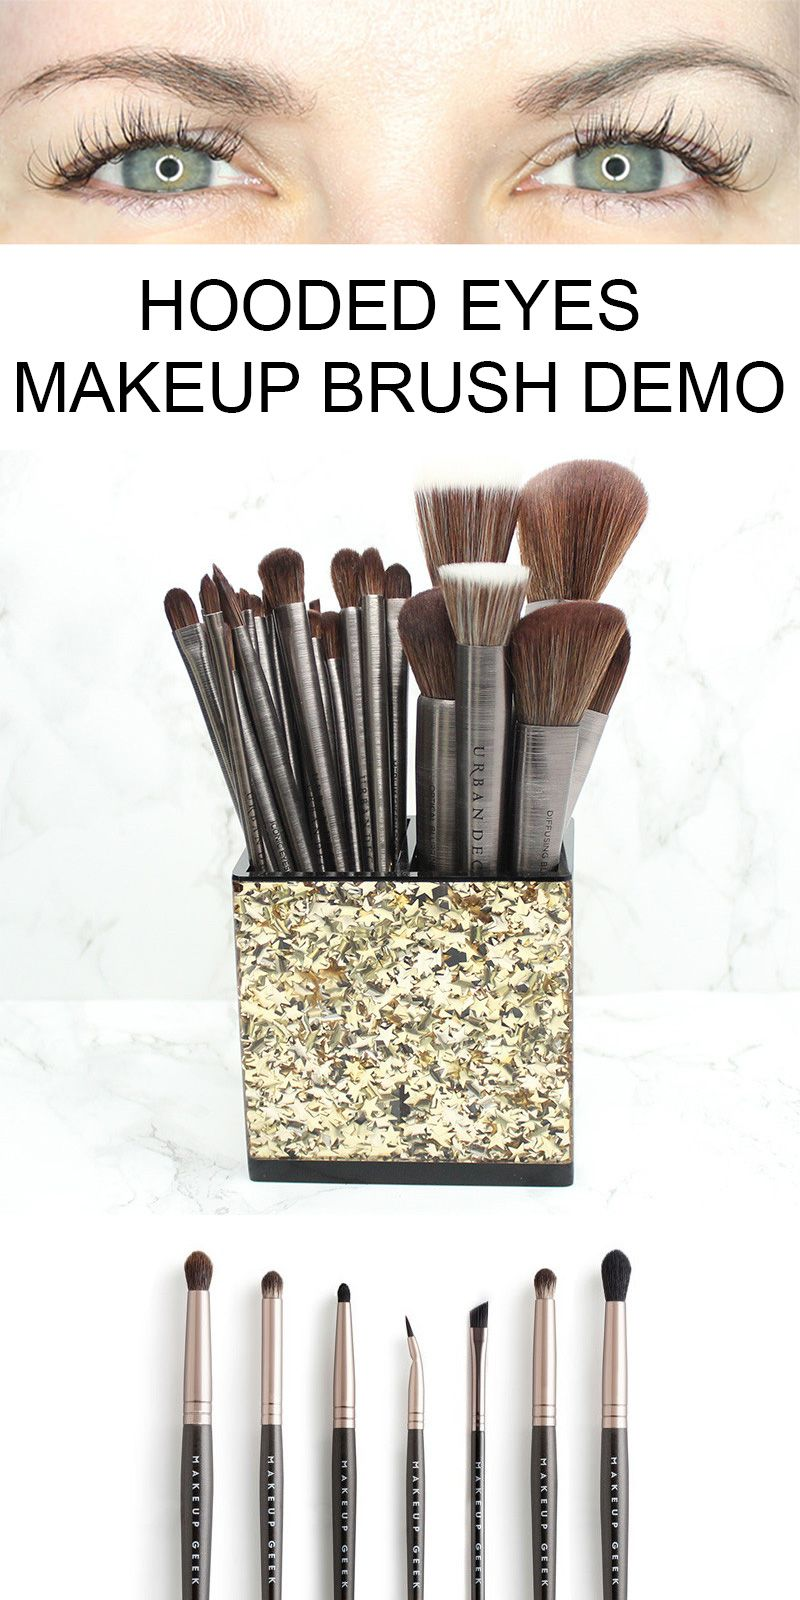 What Are Hooded Eyes Makeup Brush Demo Eye makeup